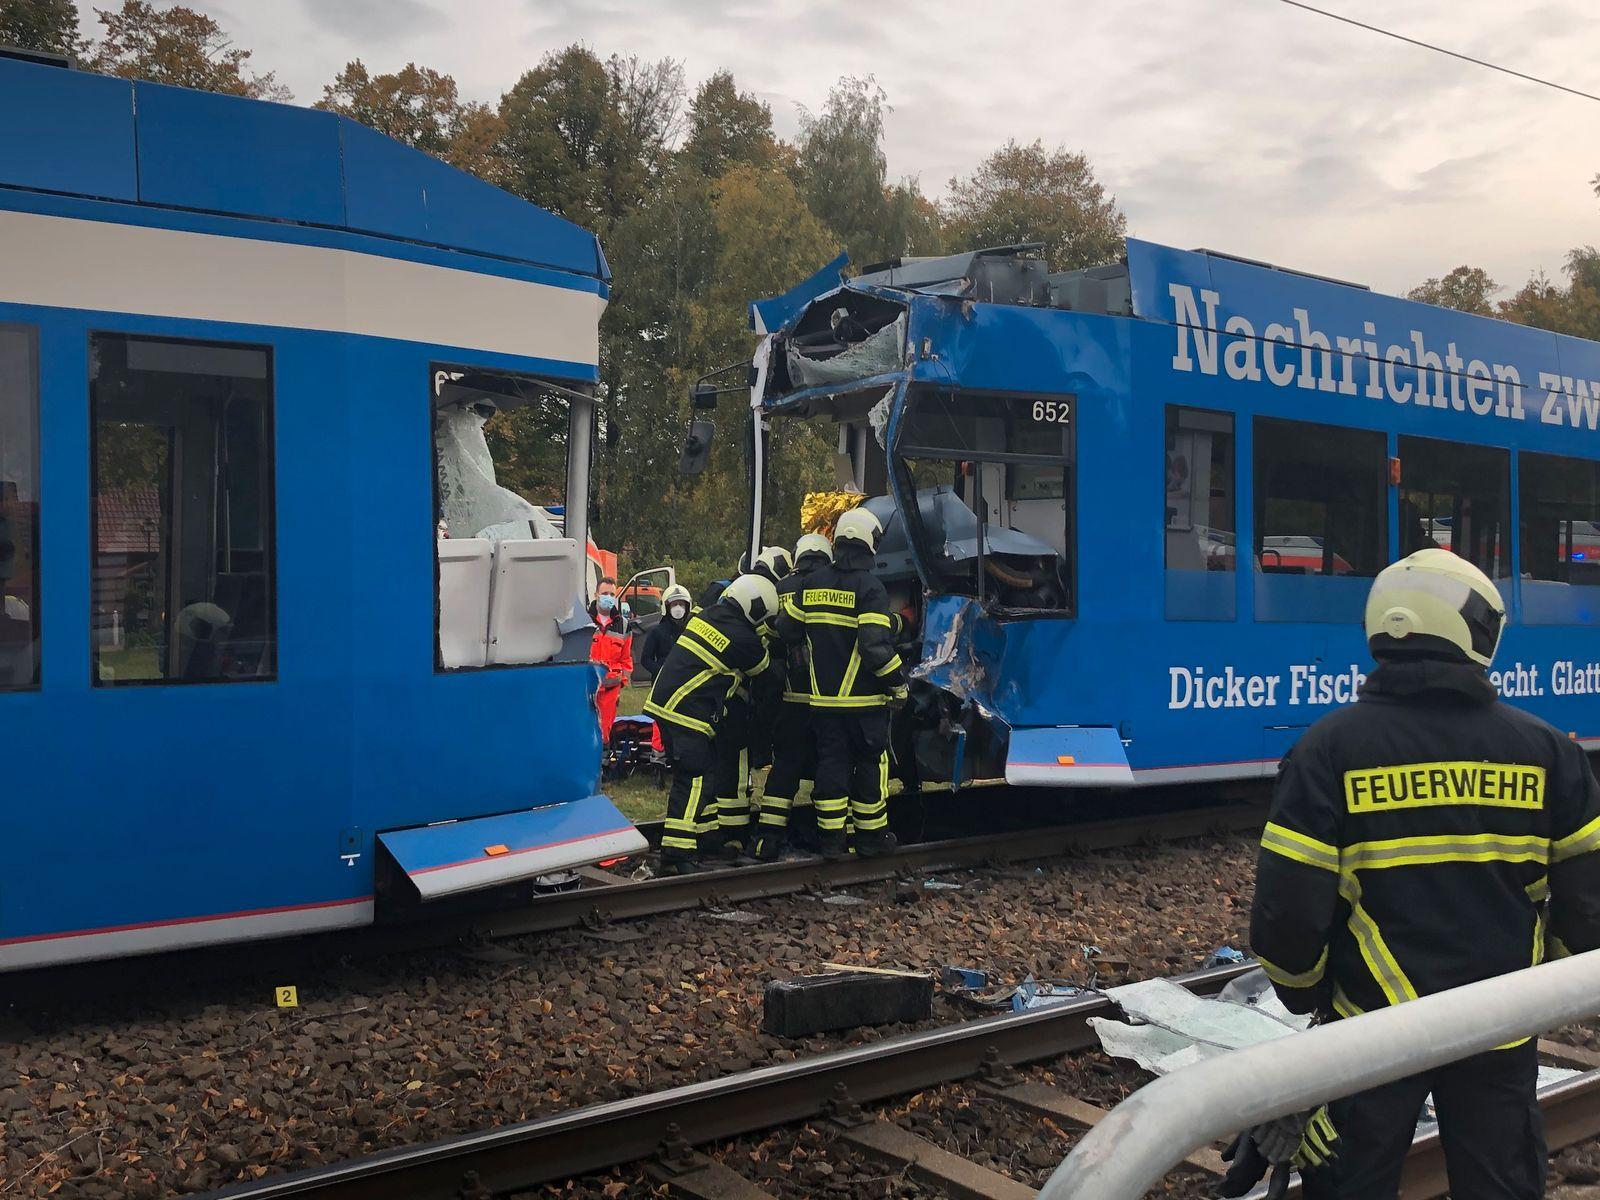 Verletzte bei Straßenbahnkollision in Rostock